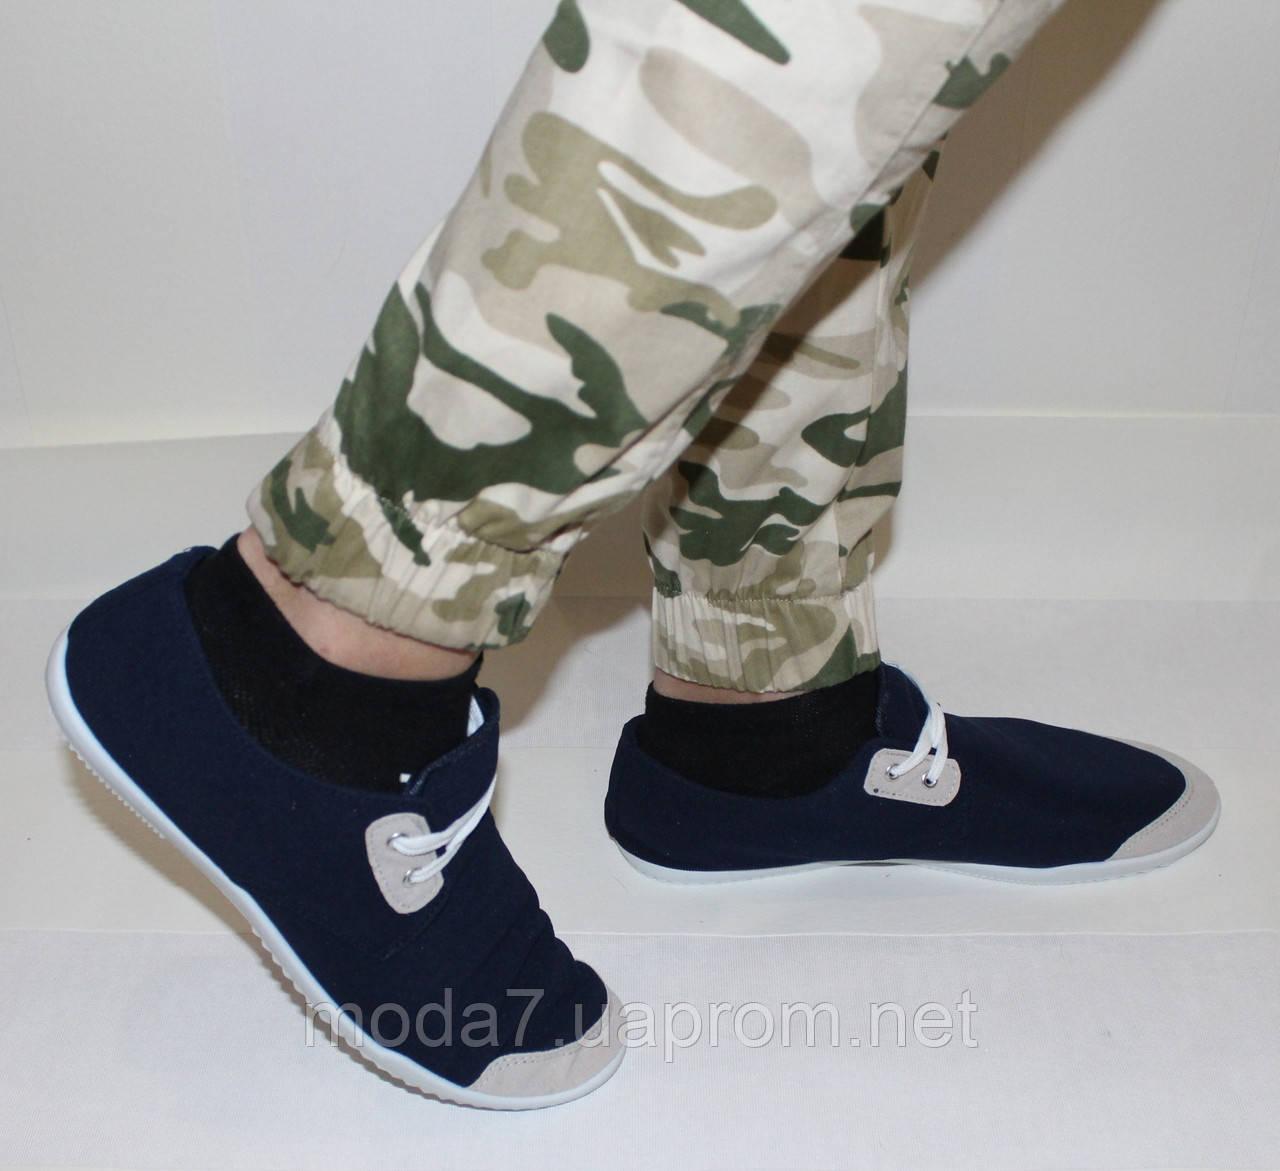 Мокасины - чешки мужские синие на шнурках